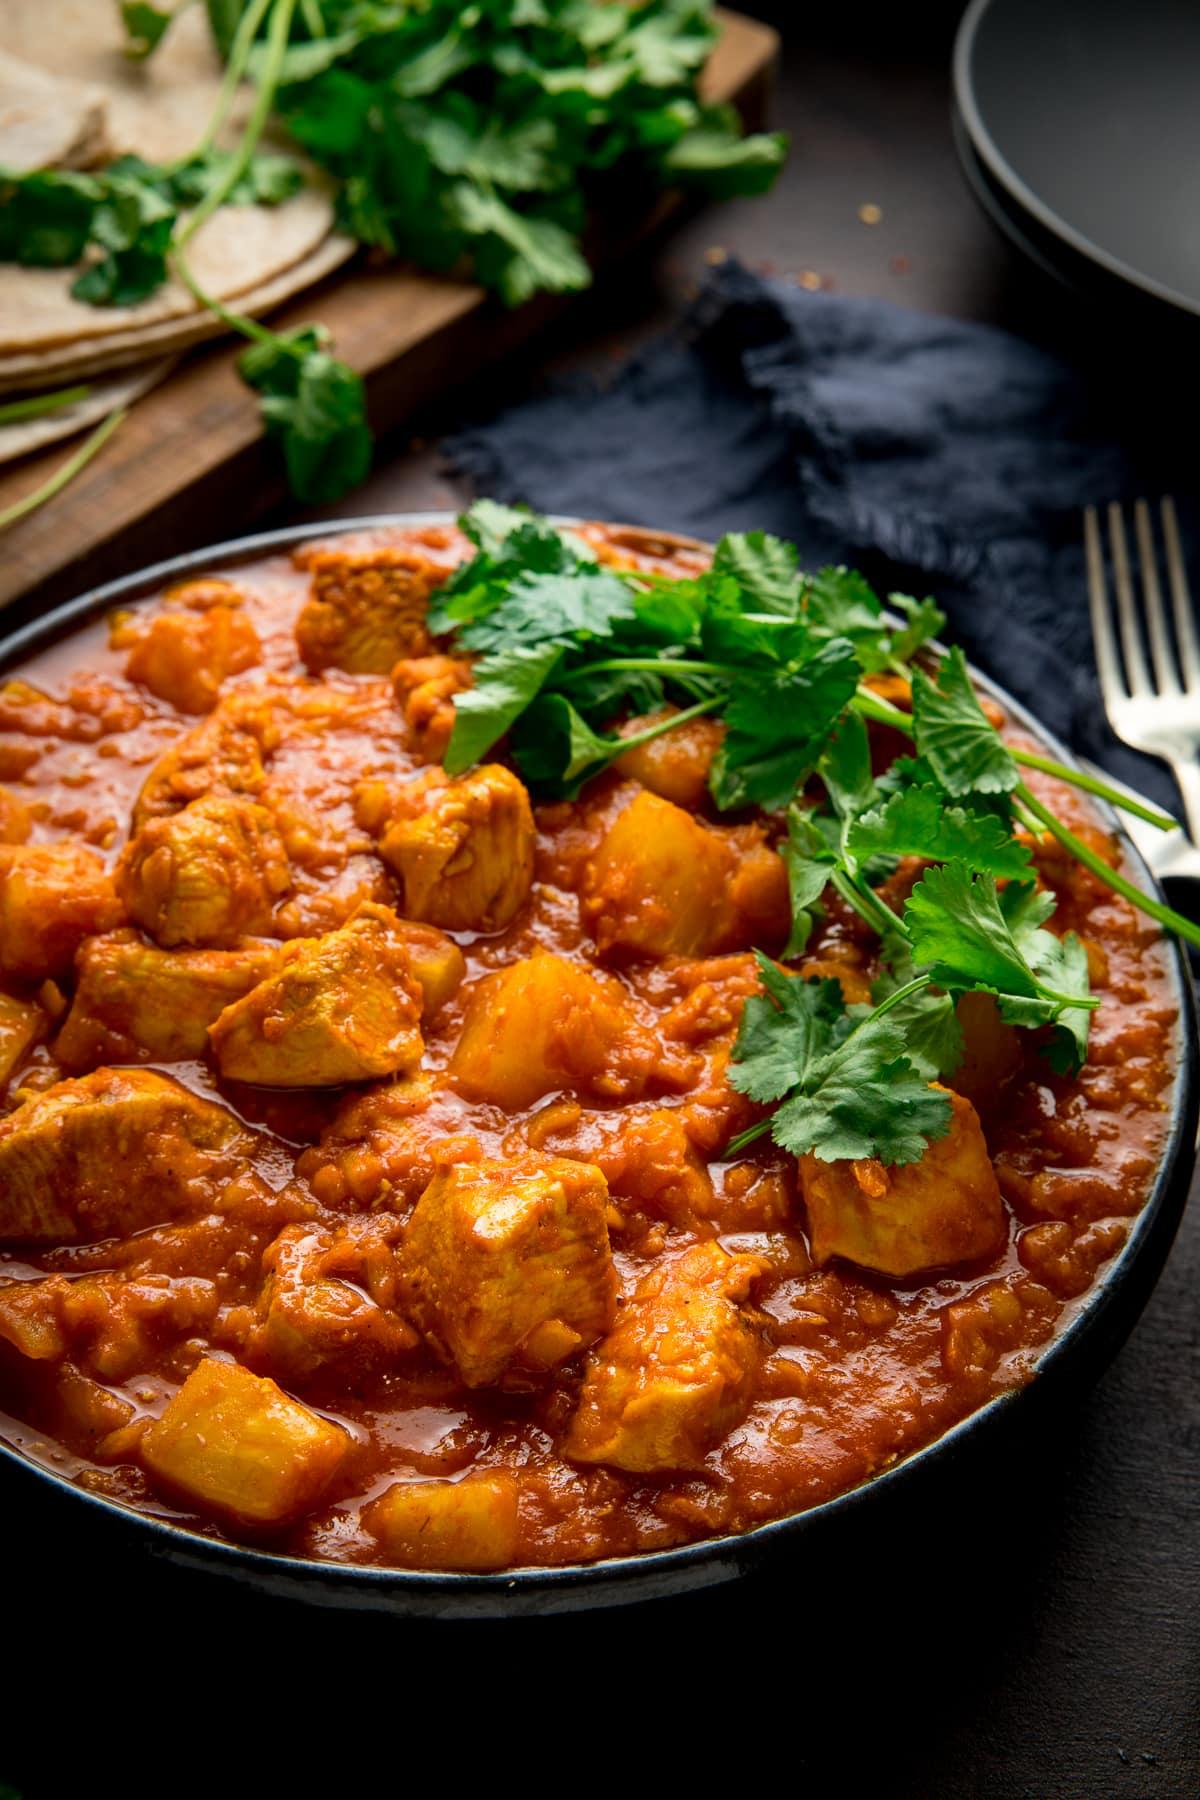 chicken dhansak in a bowl with coriander on top